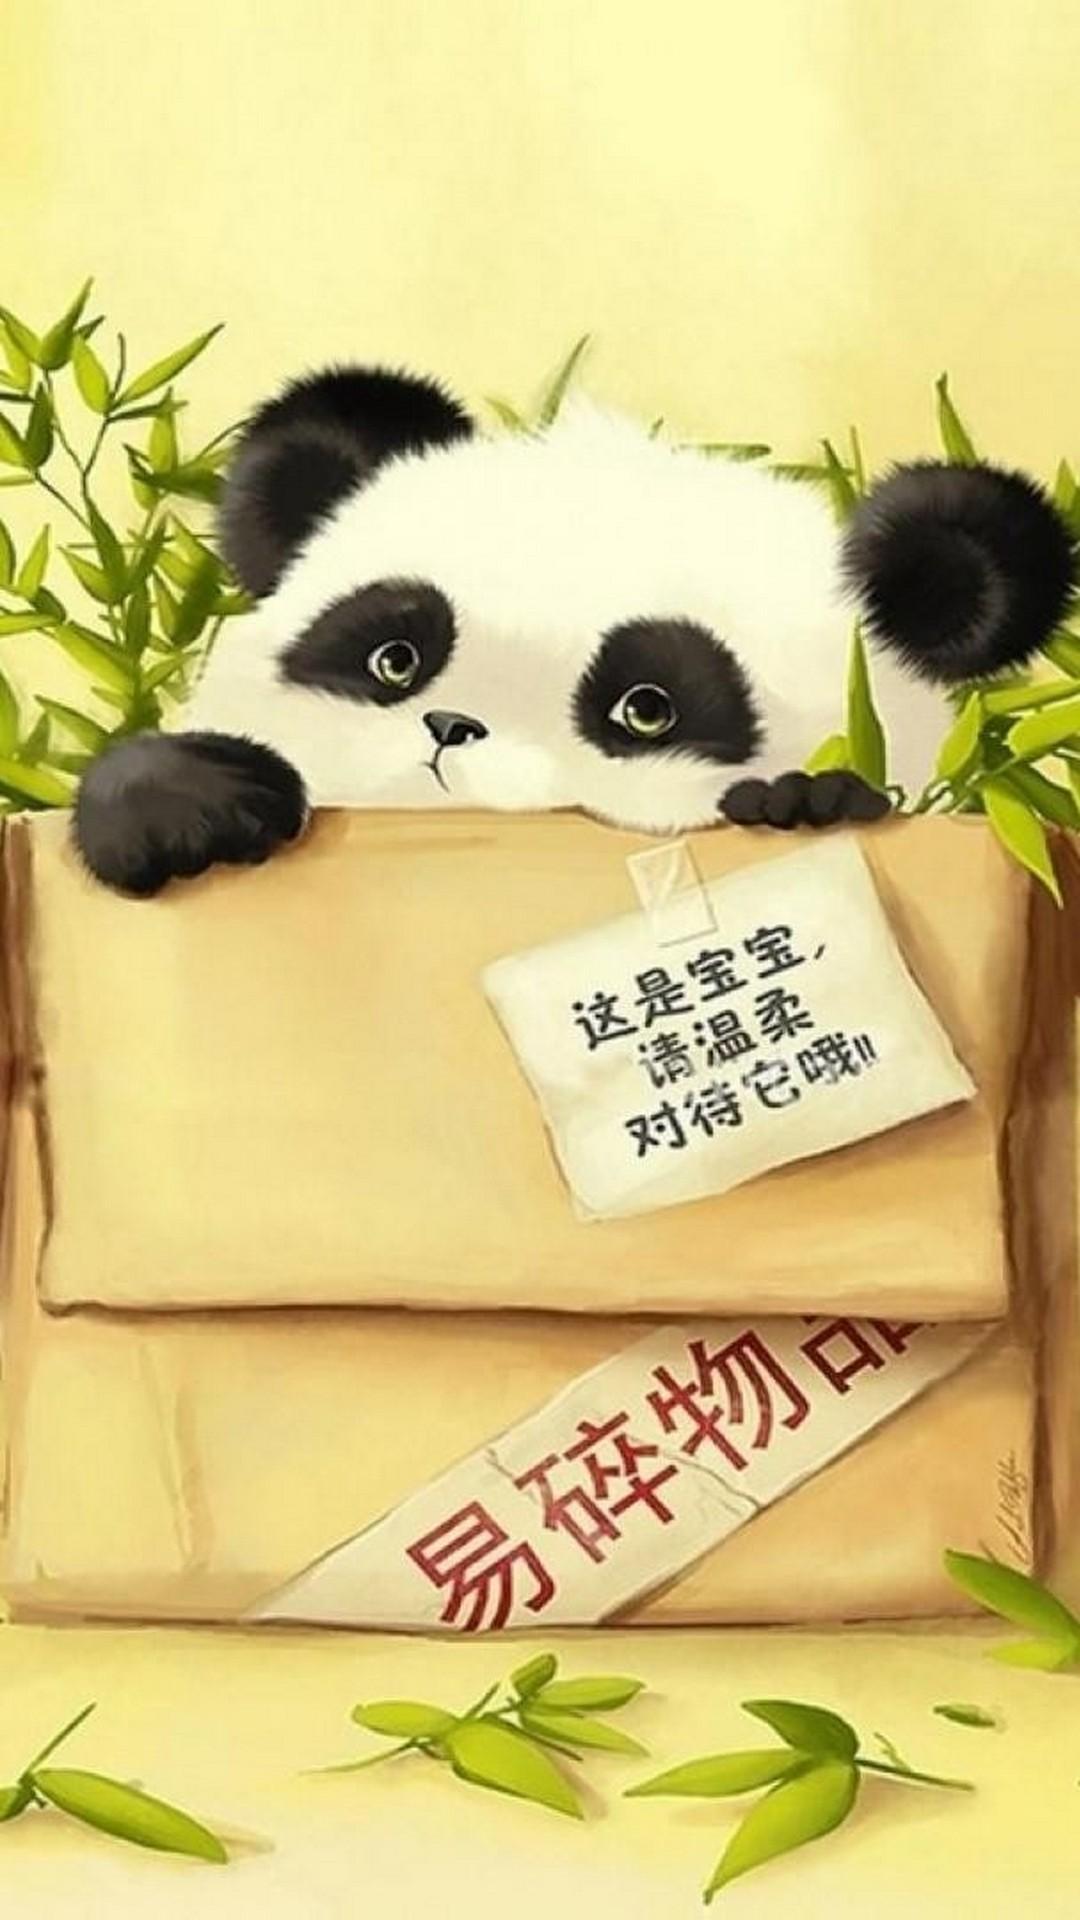 Android Wallpaper Cute Panda With Hd Resolution Cute Panda